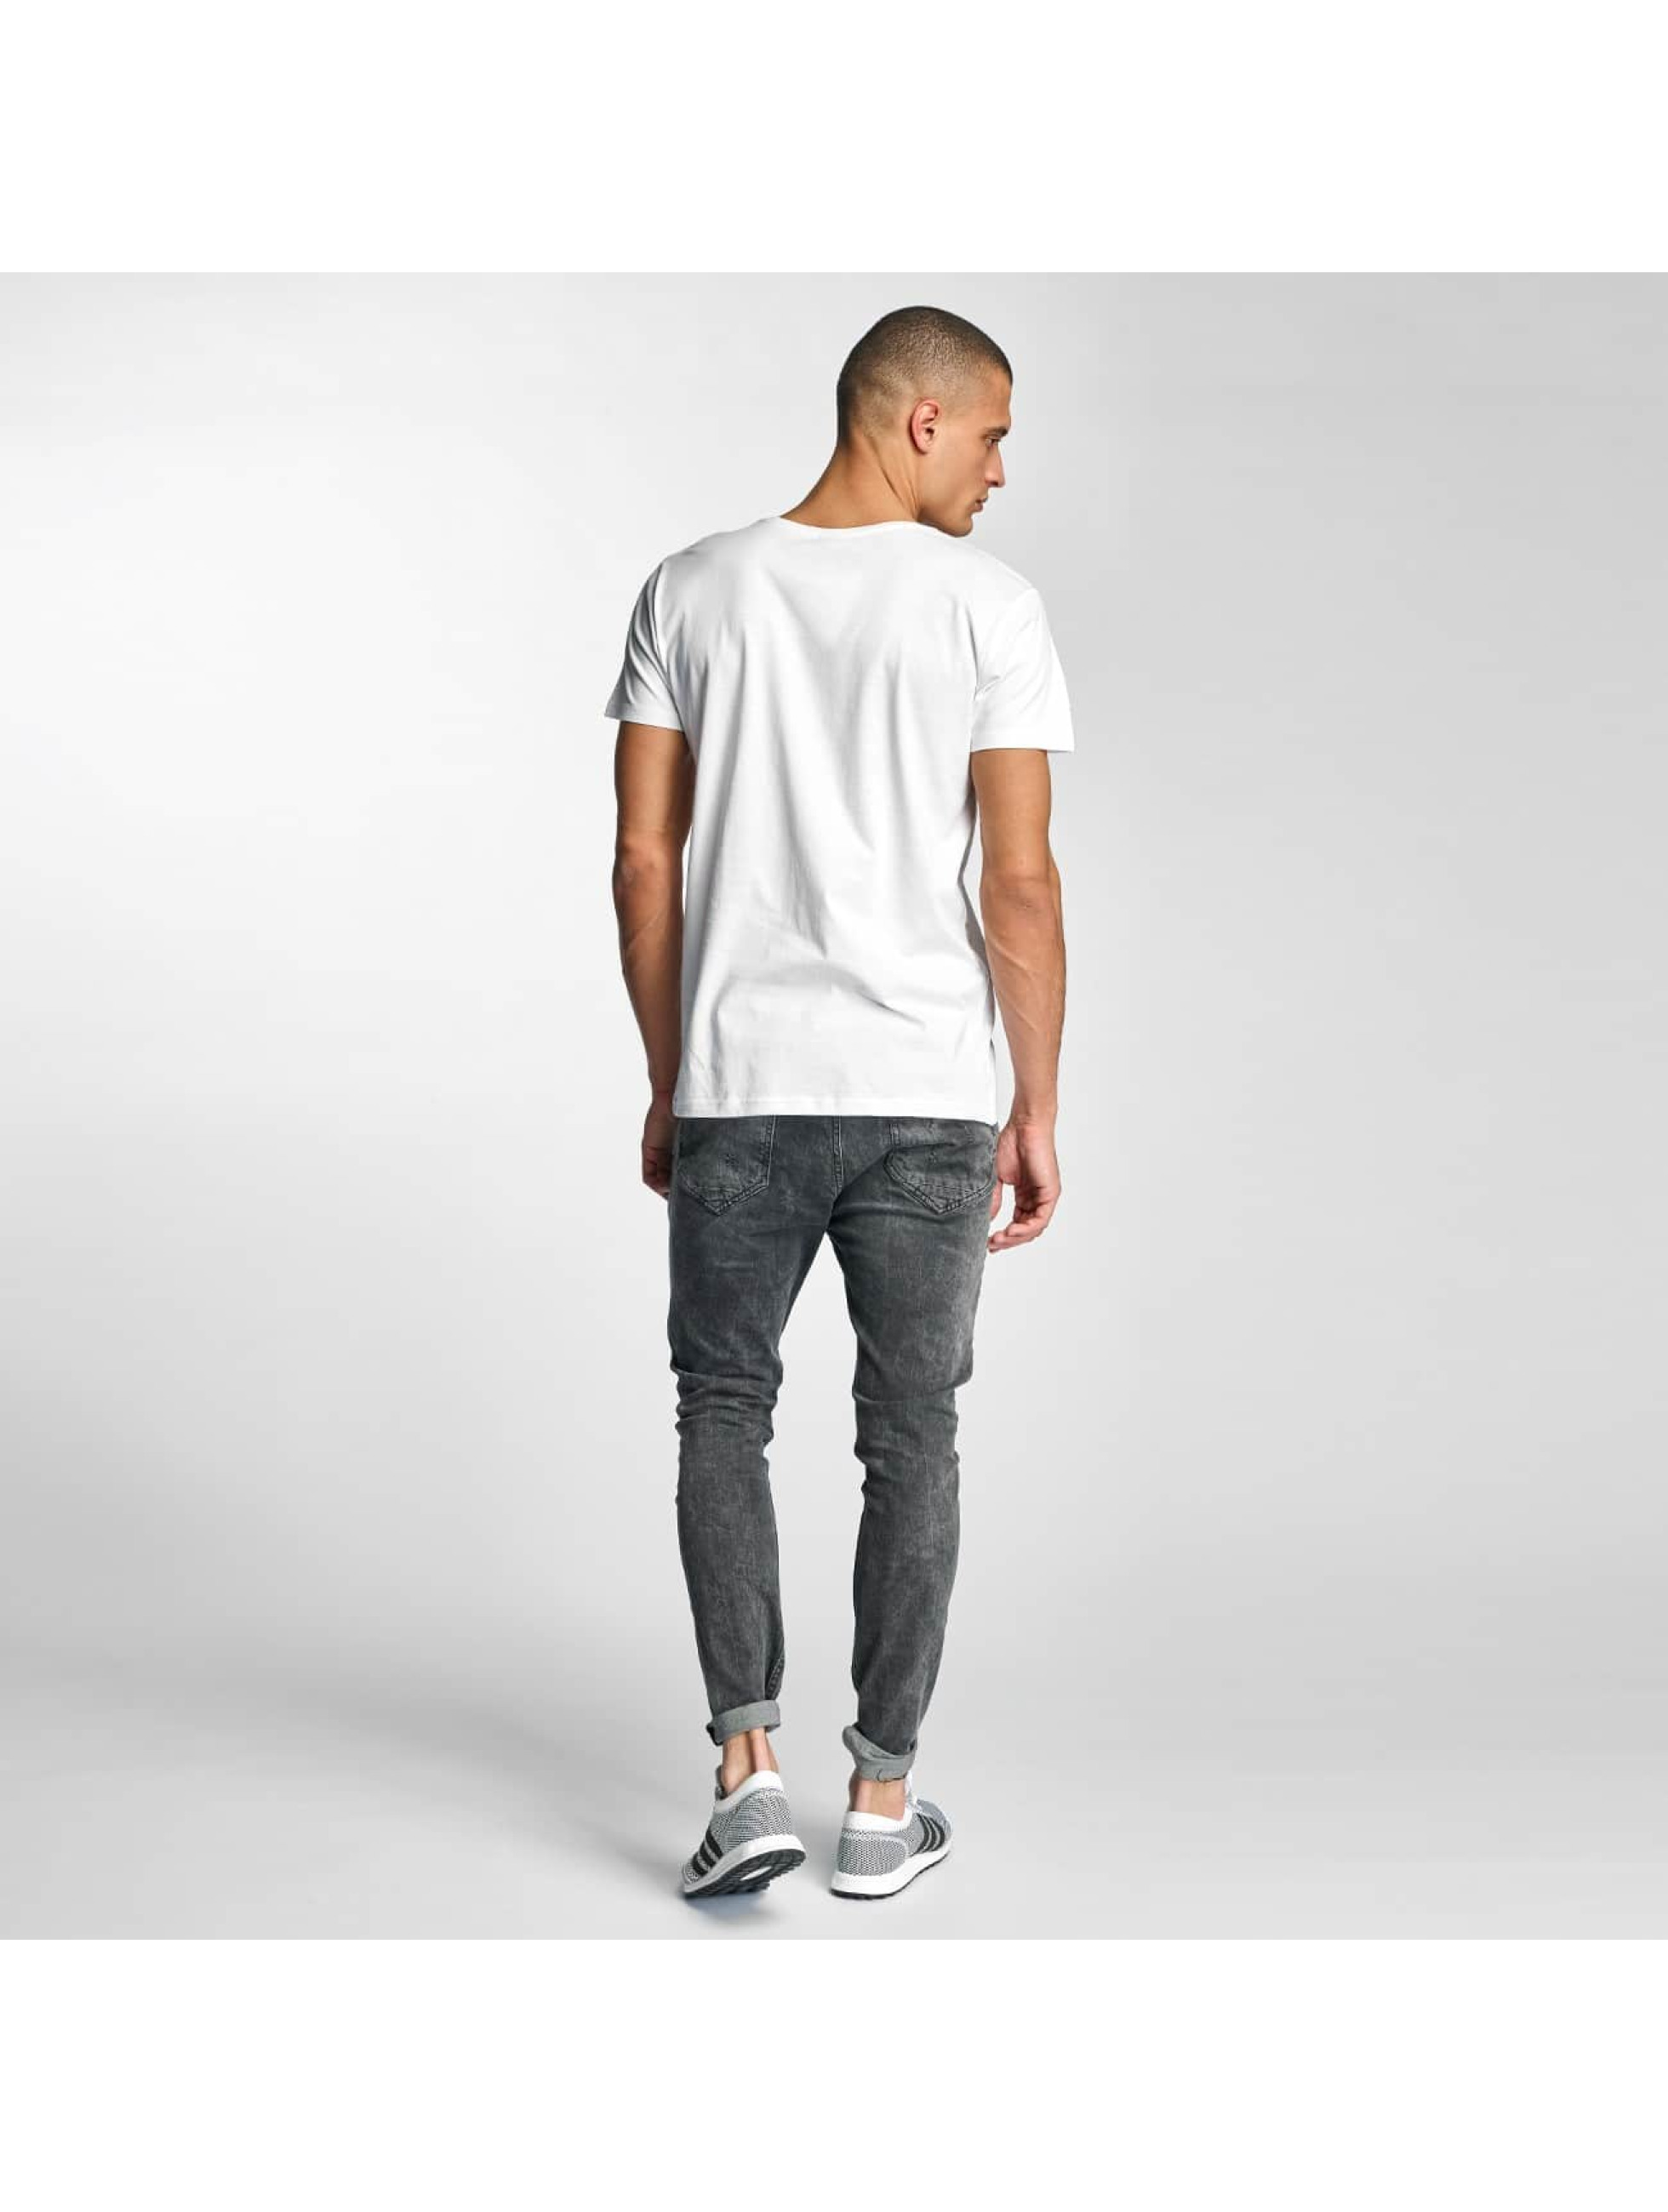 Stitch & Soul Camiseta Hang Aroun blanco